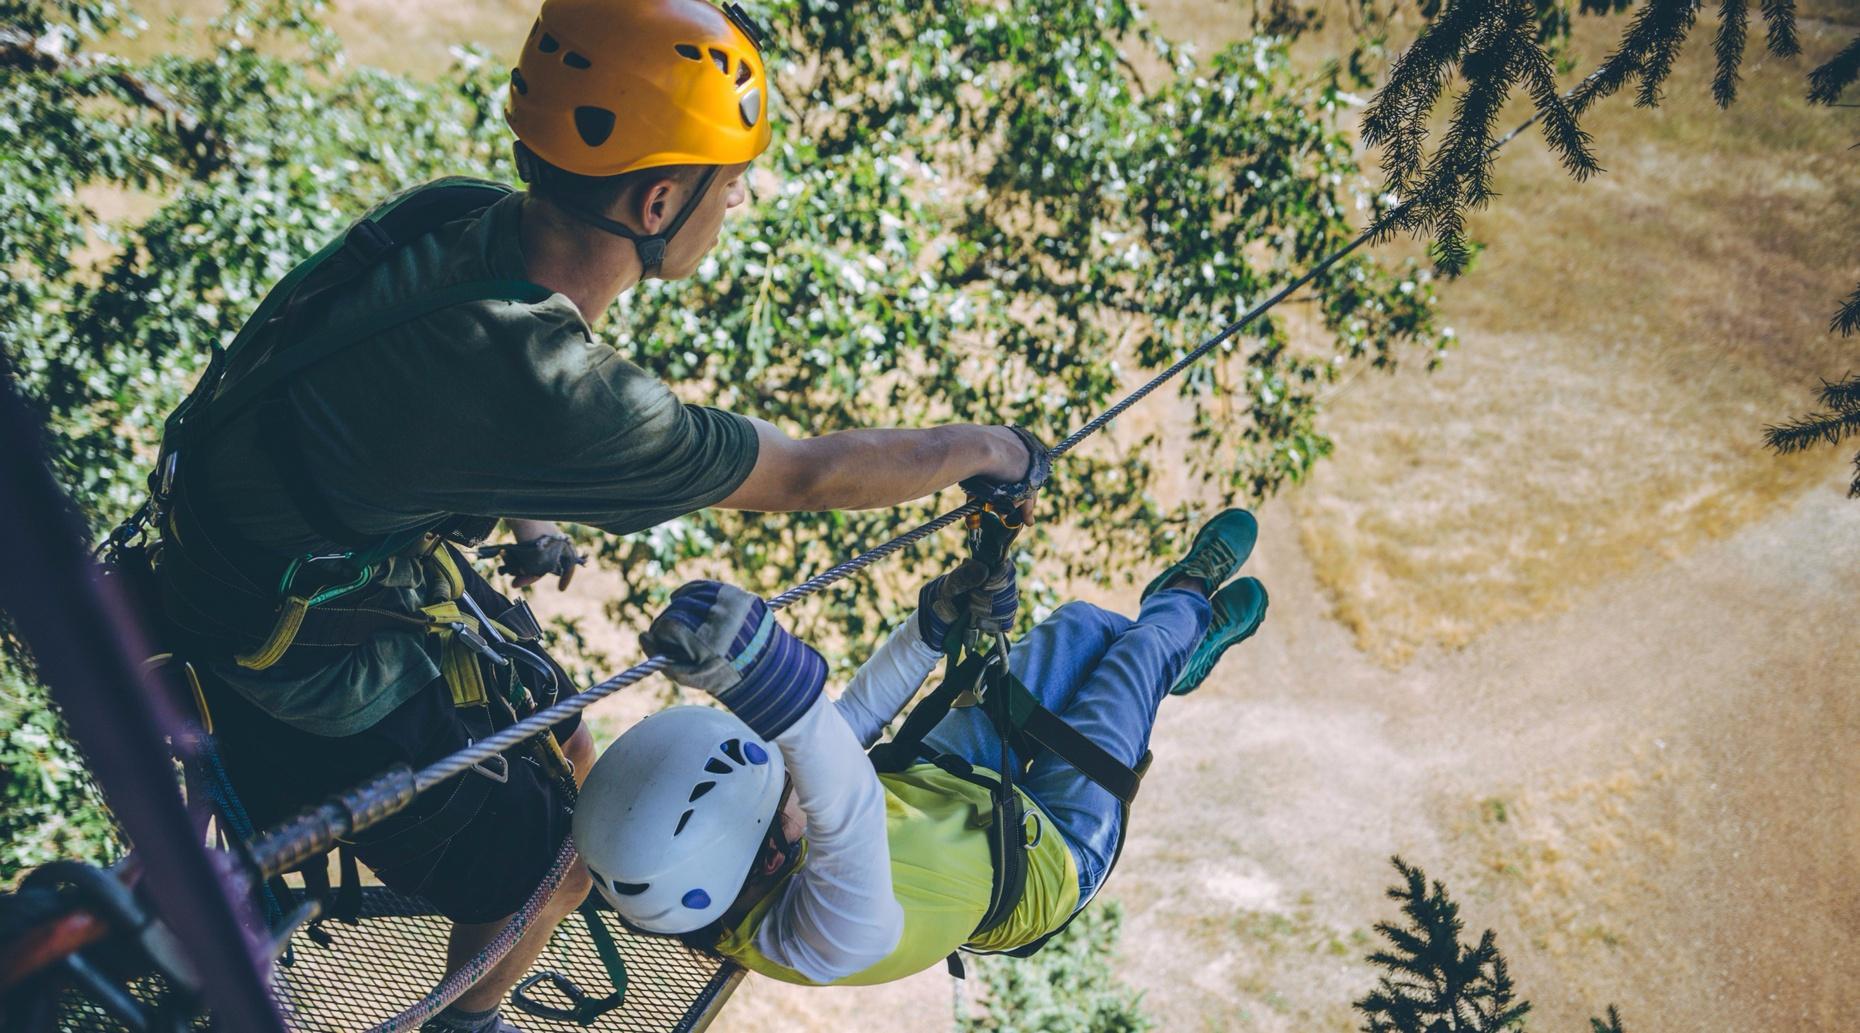 Treehouse Ziplining Adventure in Cave Junction, OR